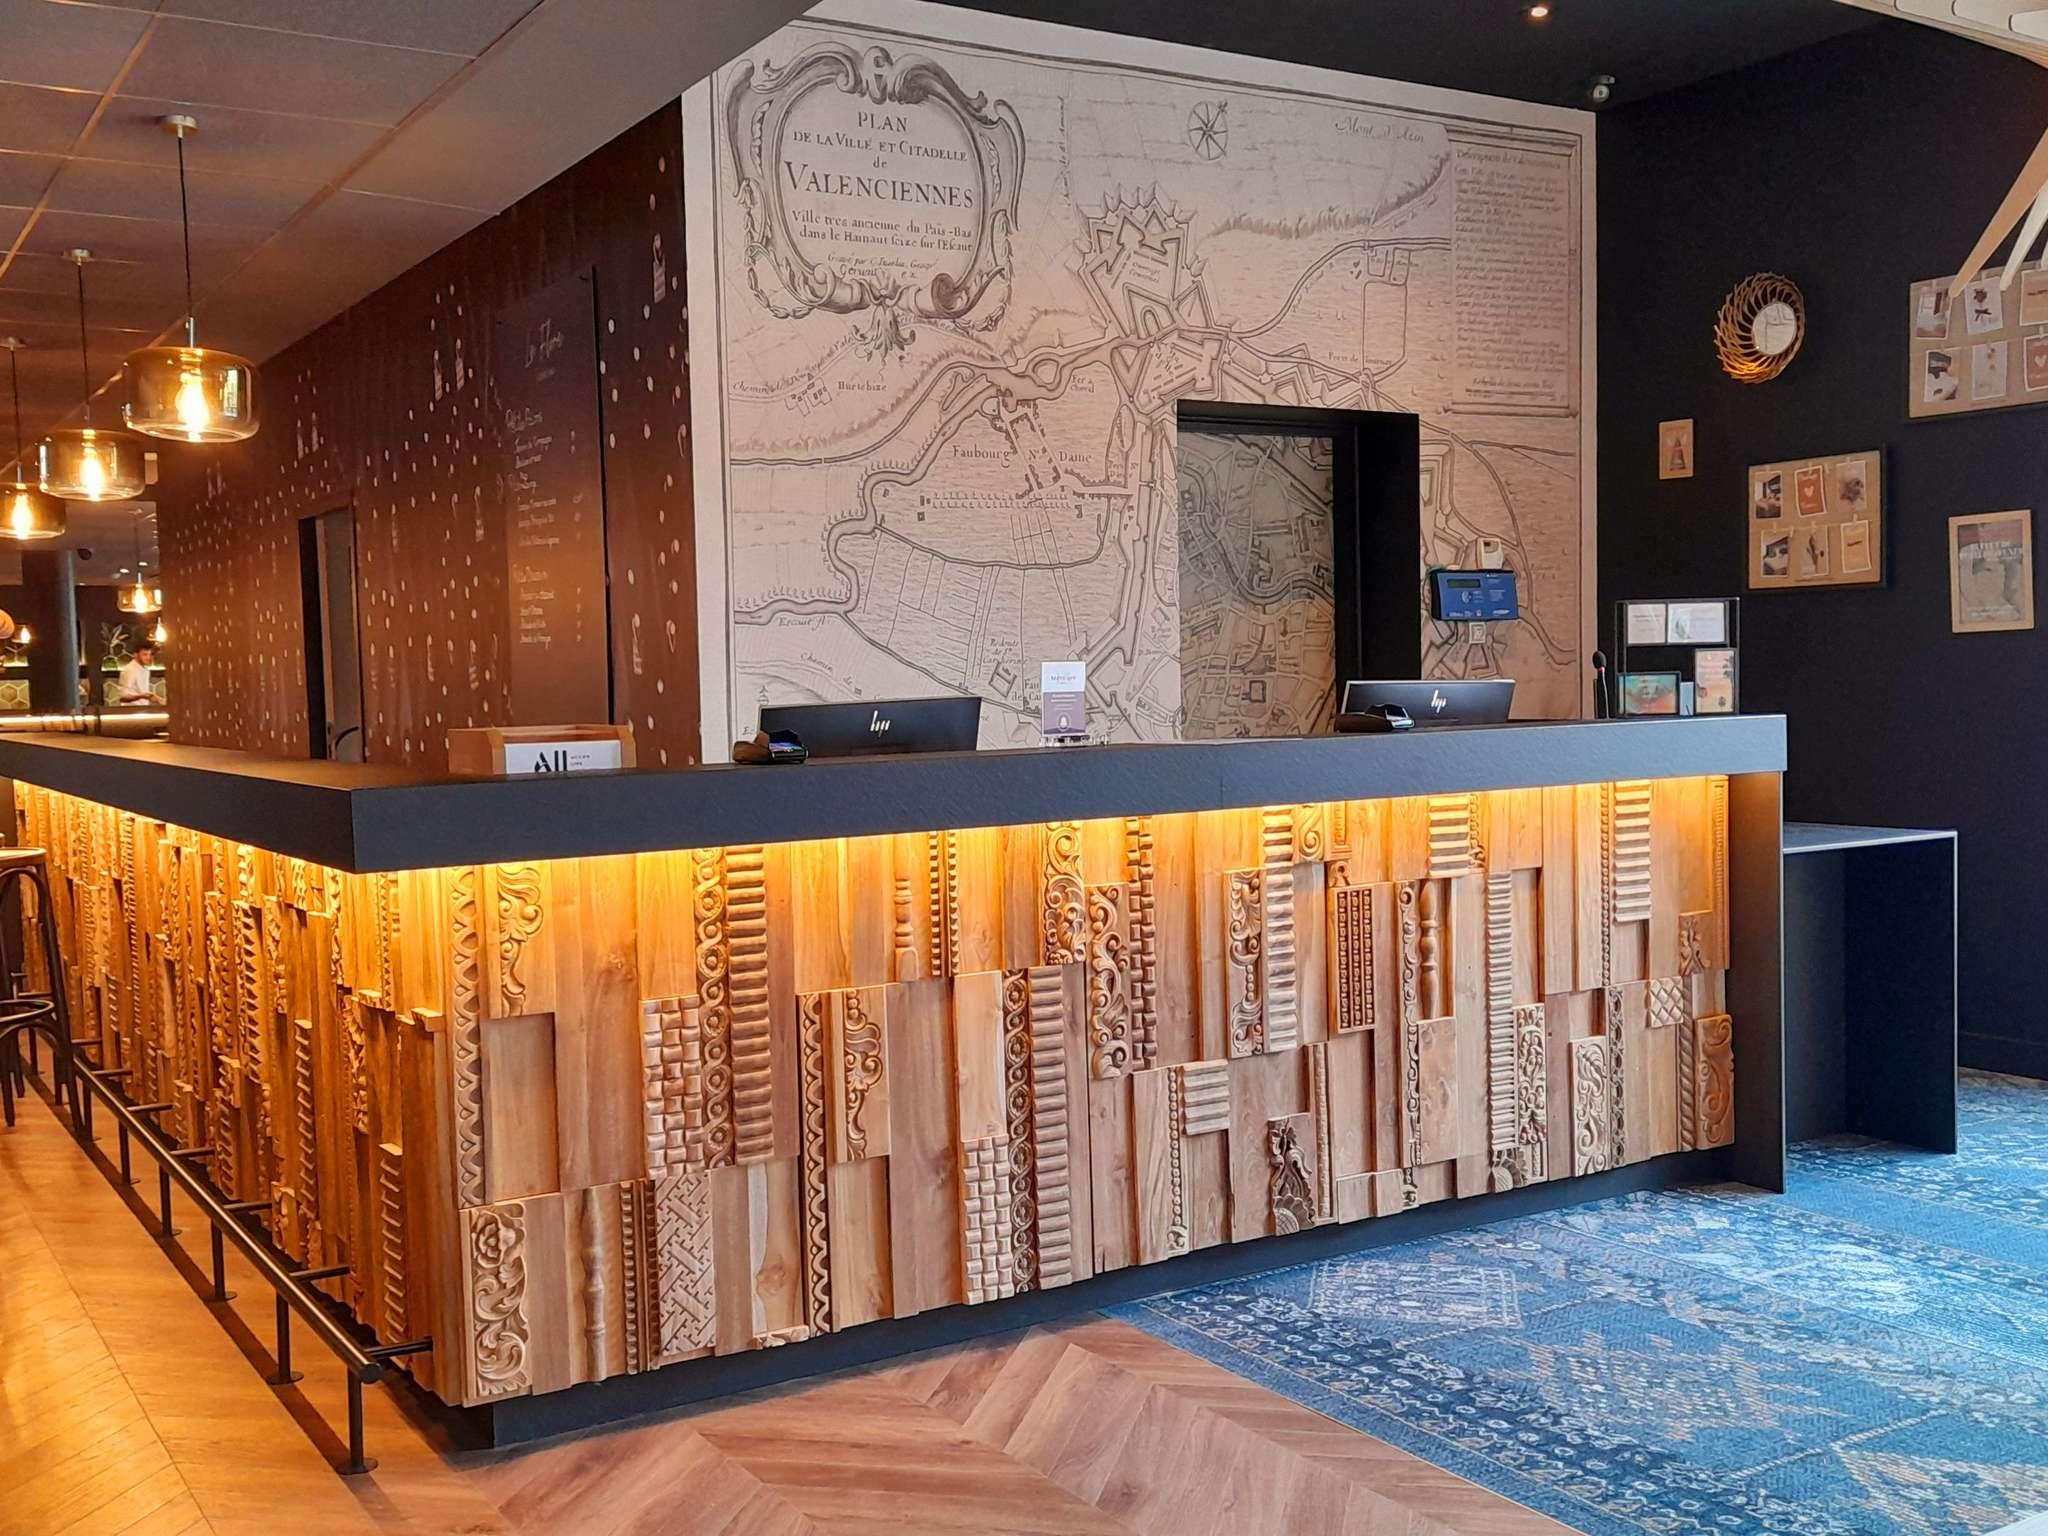 Hotel - Mercure Valenciennes Centre Hotel